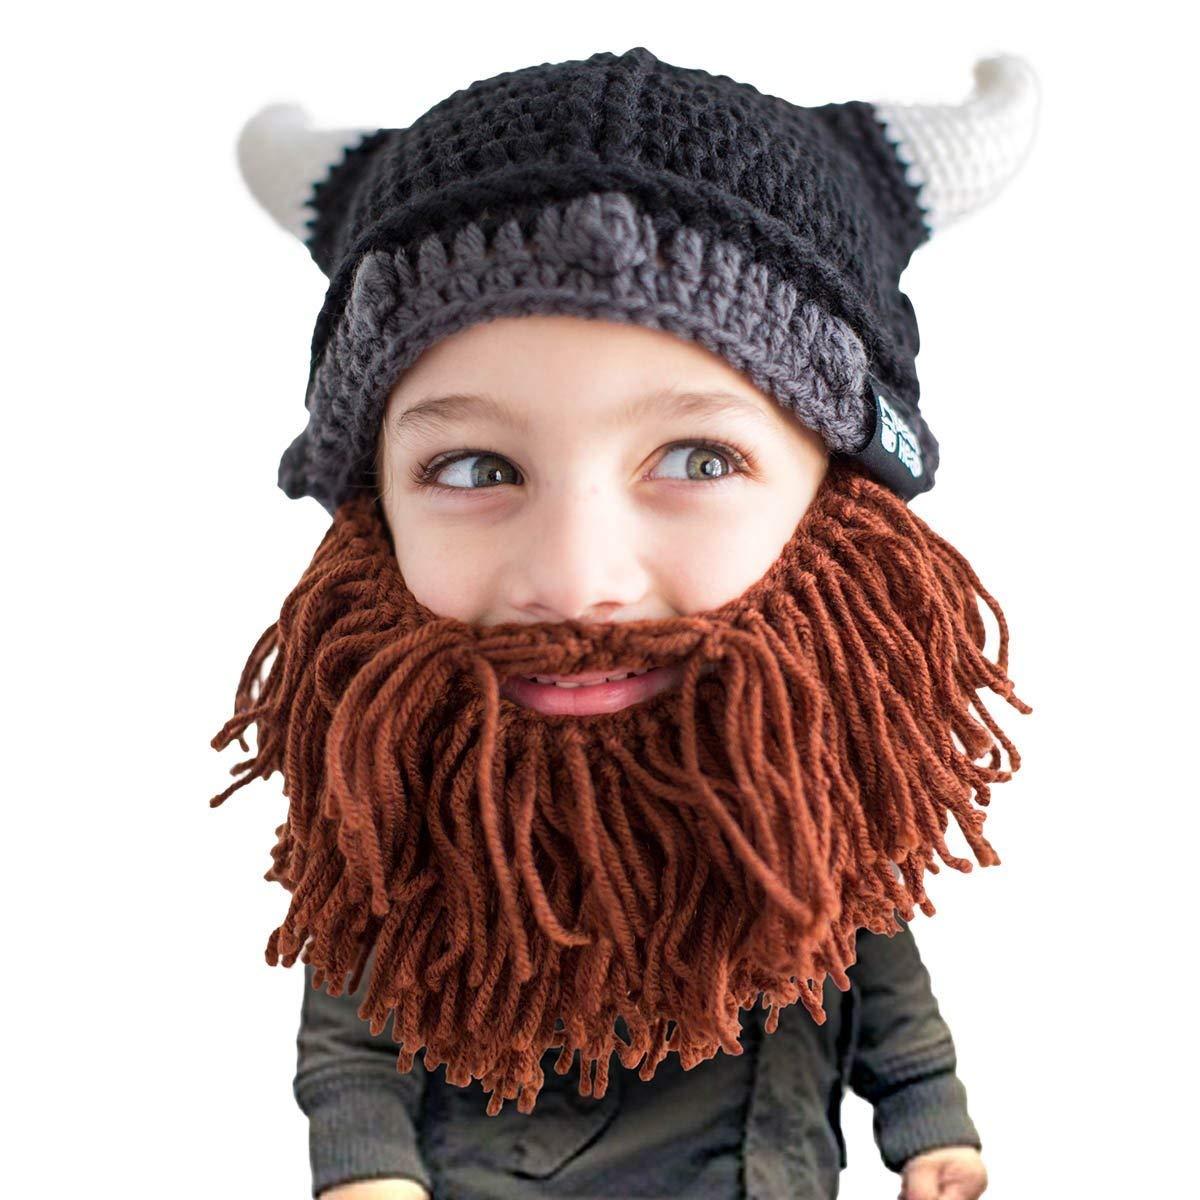 Beard Head - The Original Kid Populous Knit Beard Hat KD2002BR